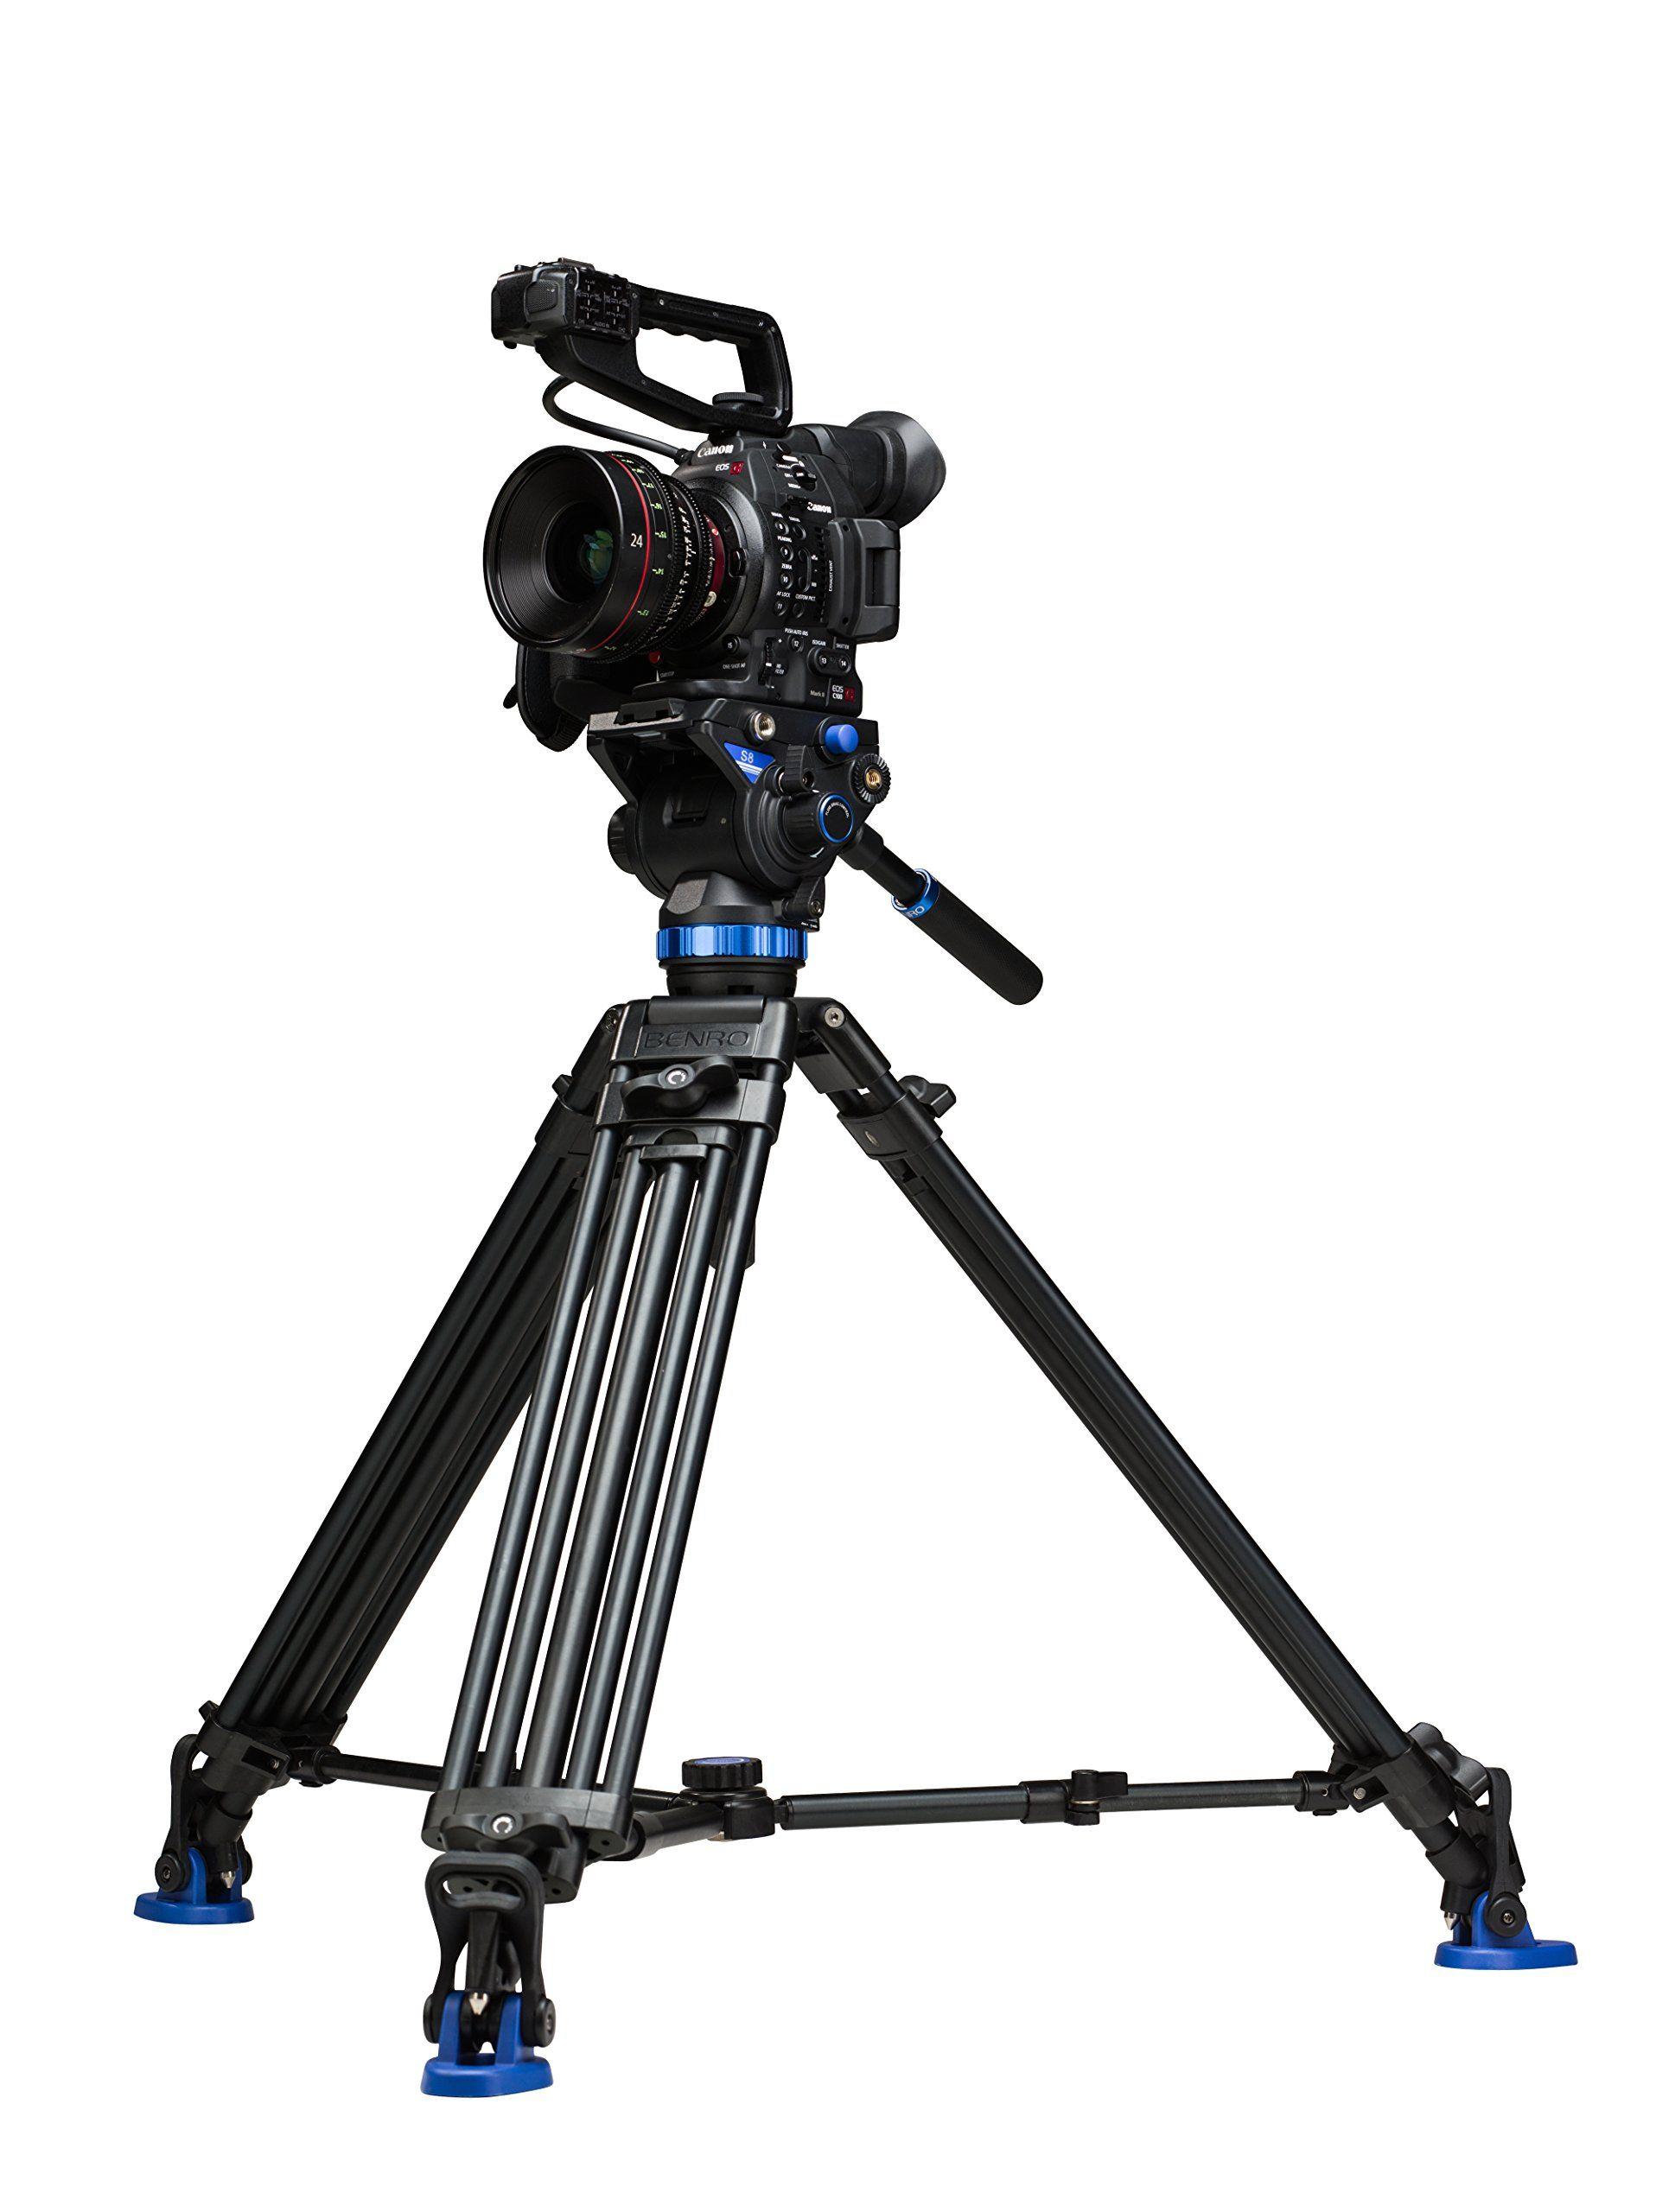 Benro S8 Twin Leg Aluminum Video Tripod Kit (A673TMBS8)